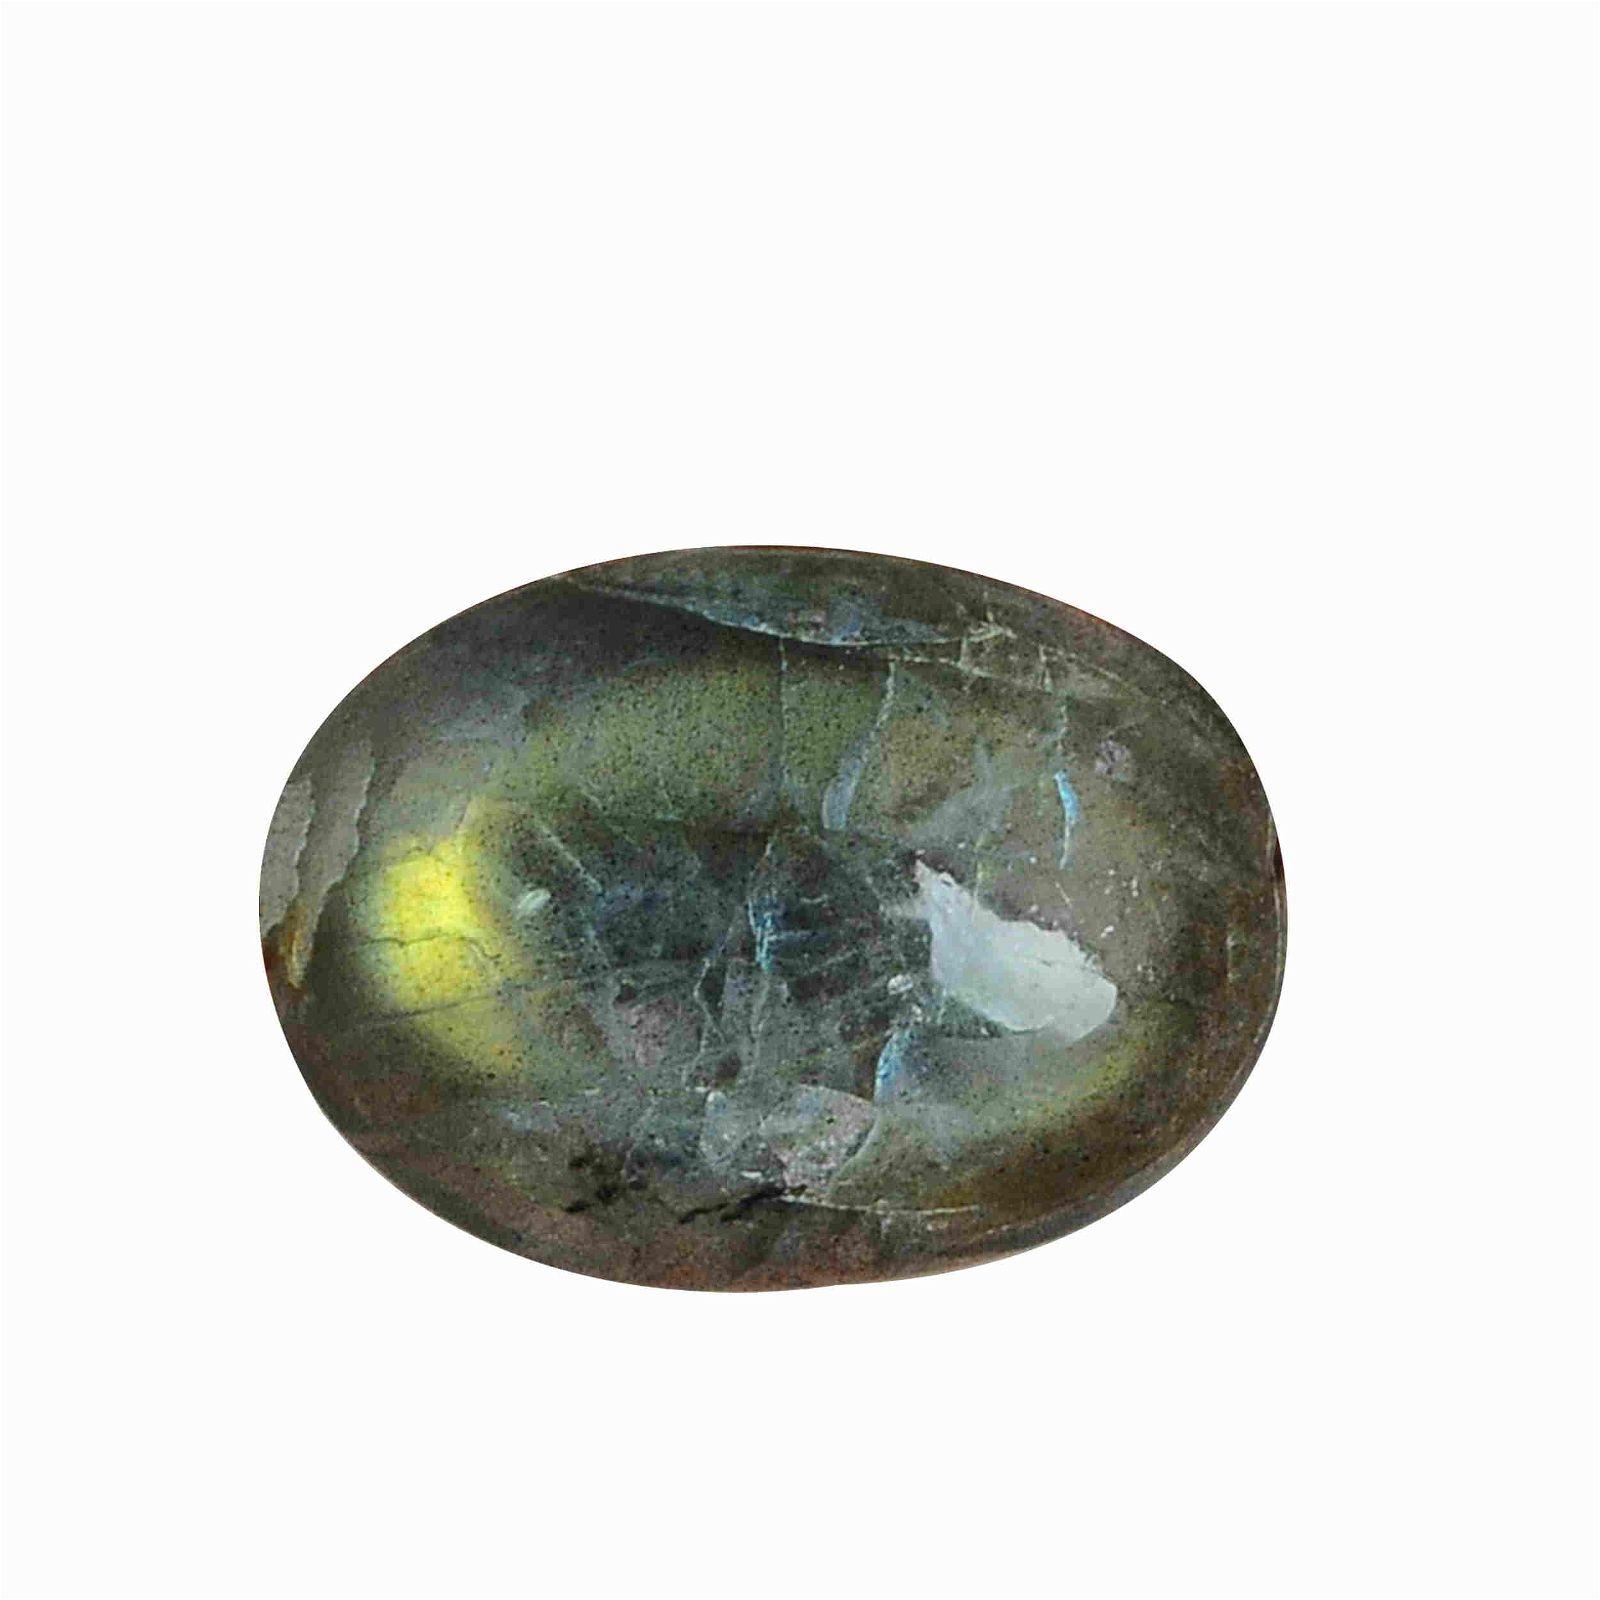 15.85 Carat Green Mix Color Natural Oval Labradorite